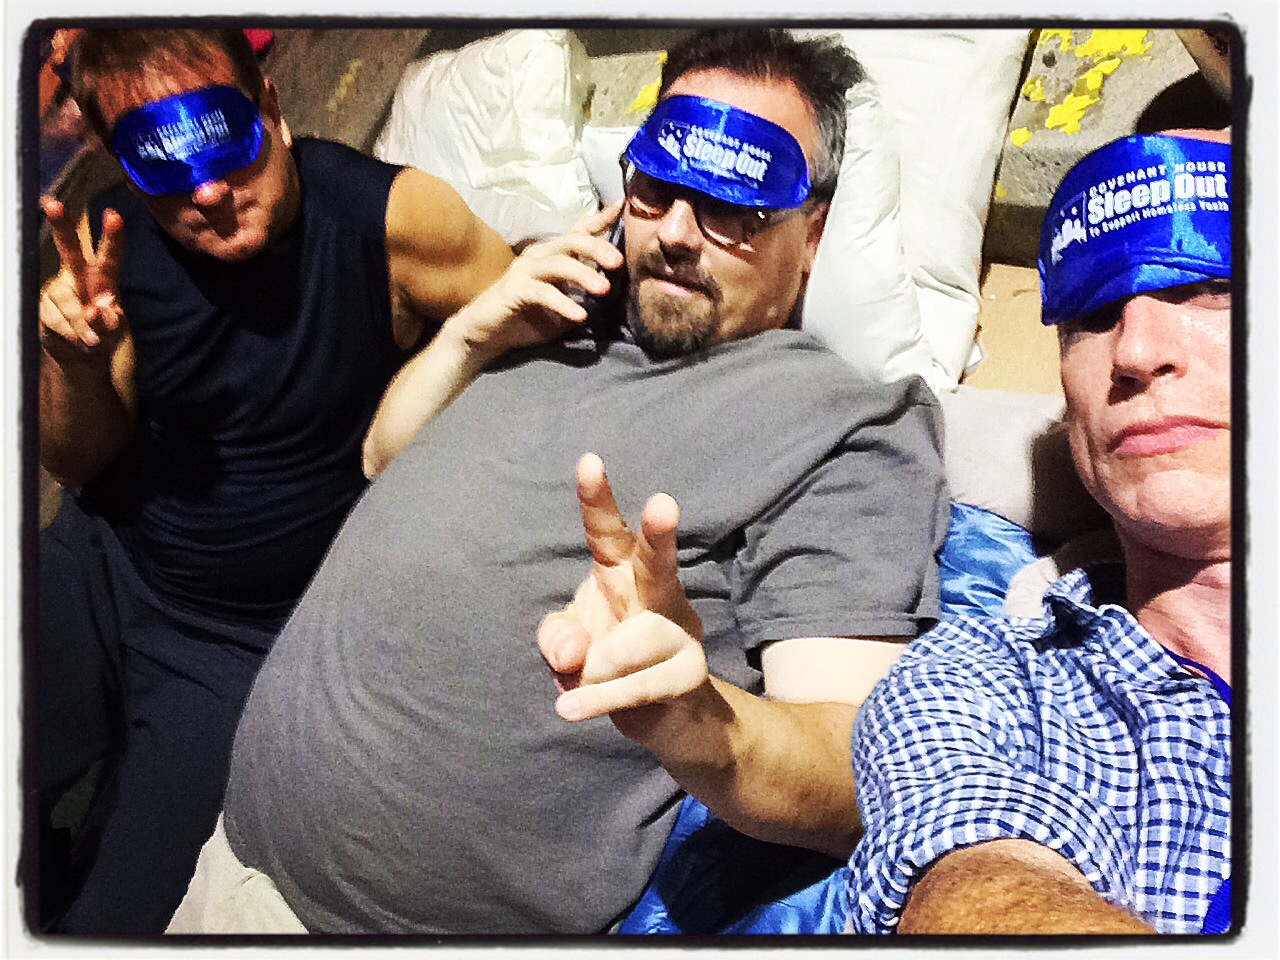 Jeff Calhoun, Tad Wilson, and Christopher Gurr Sleep Out for Covenant House